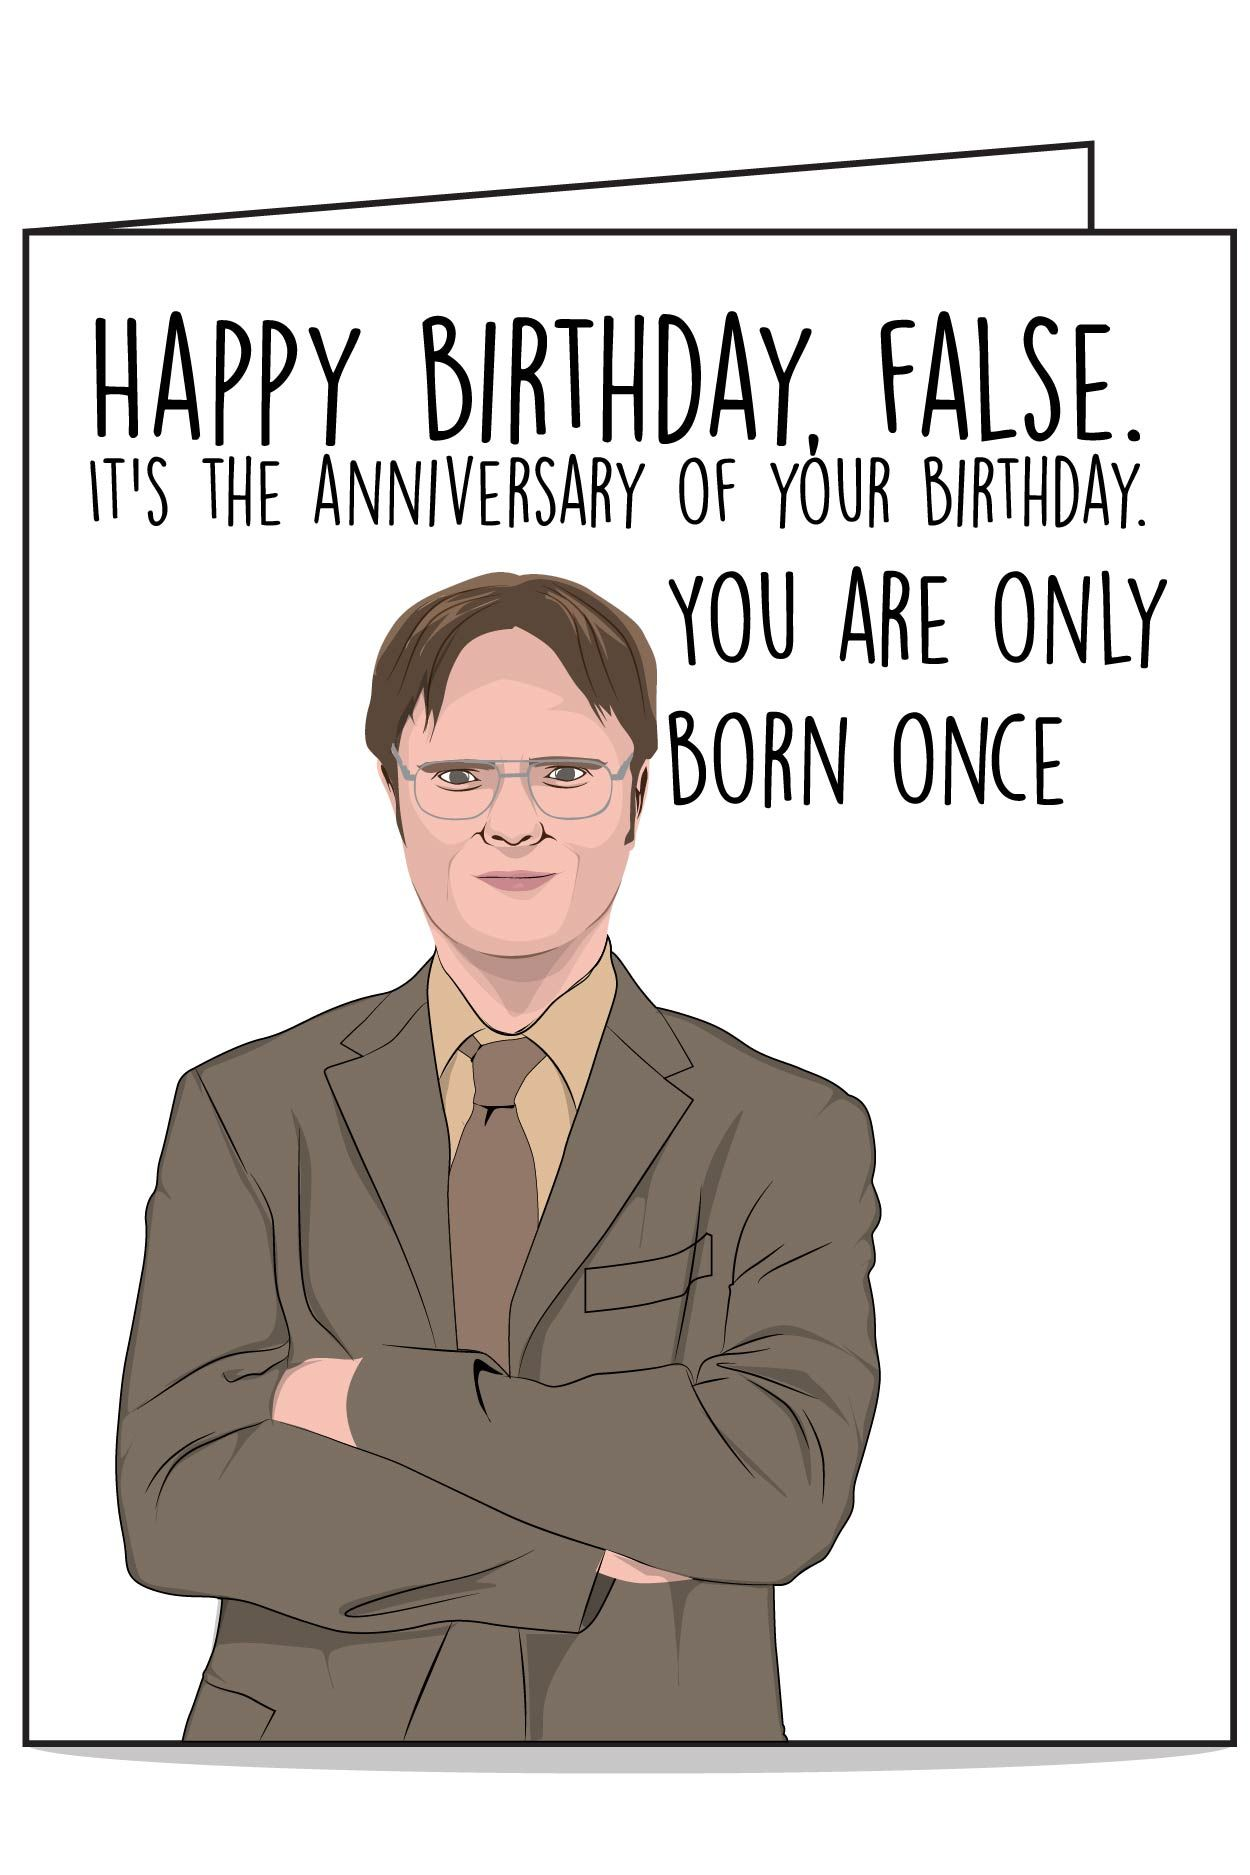 Dwight The Office Birthday Card Office Birthday Funny Birthday Cards Office Jokes